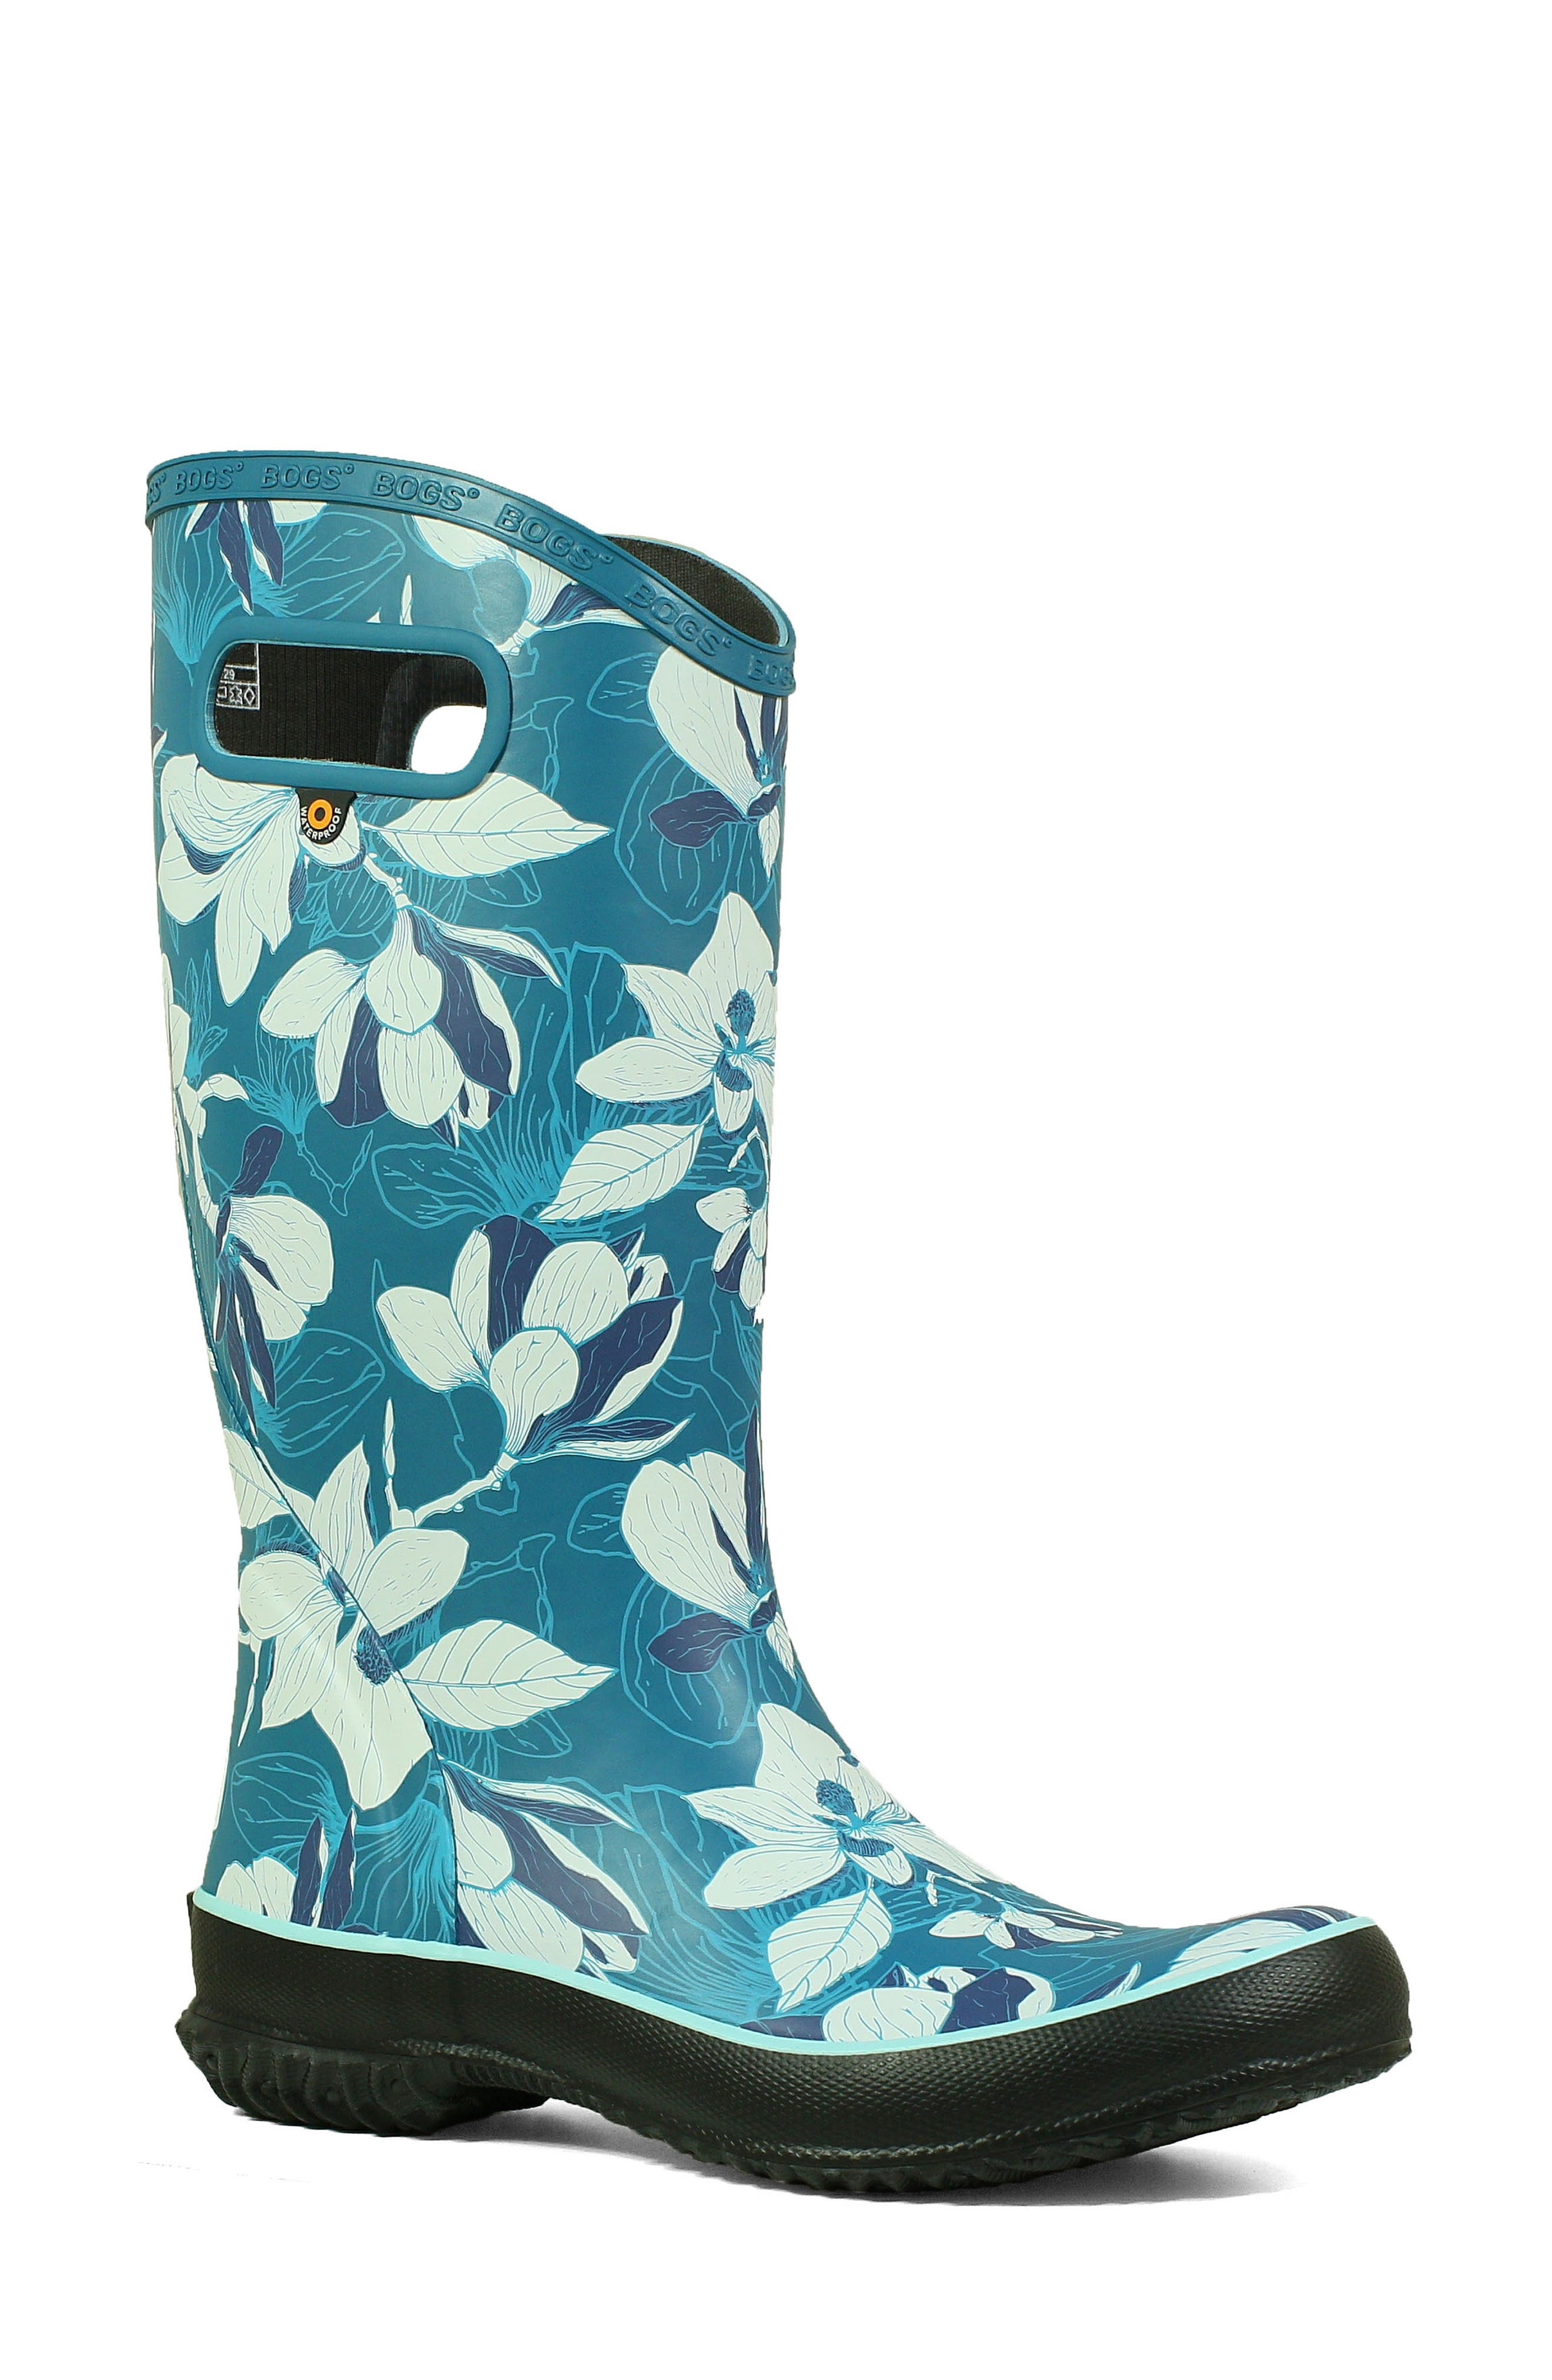 Bogs Classic Tall Waterproof Rain Boot, Blue